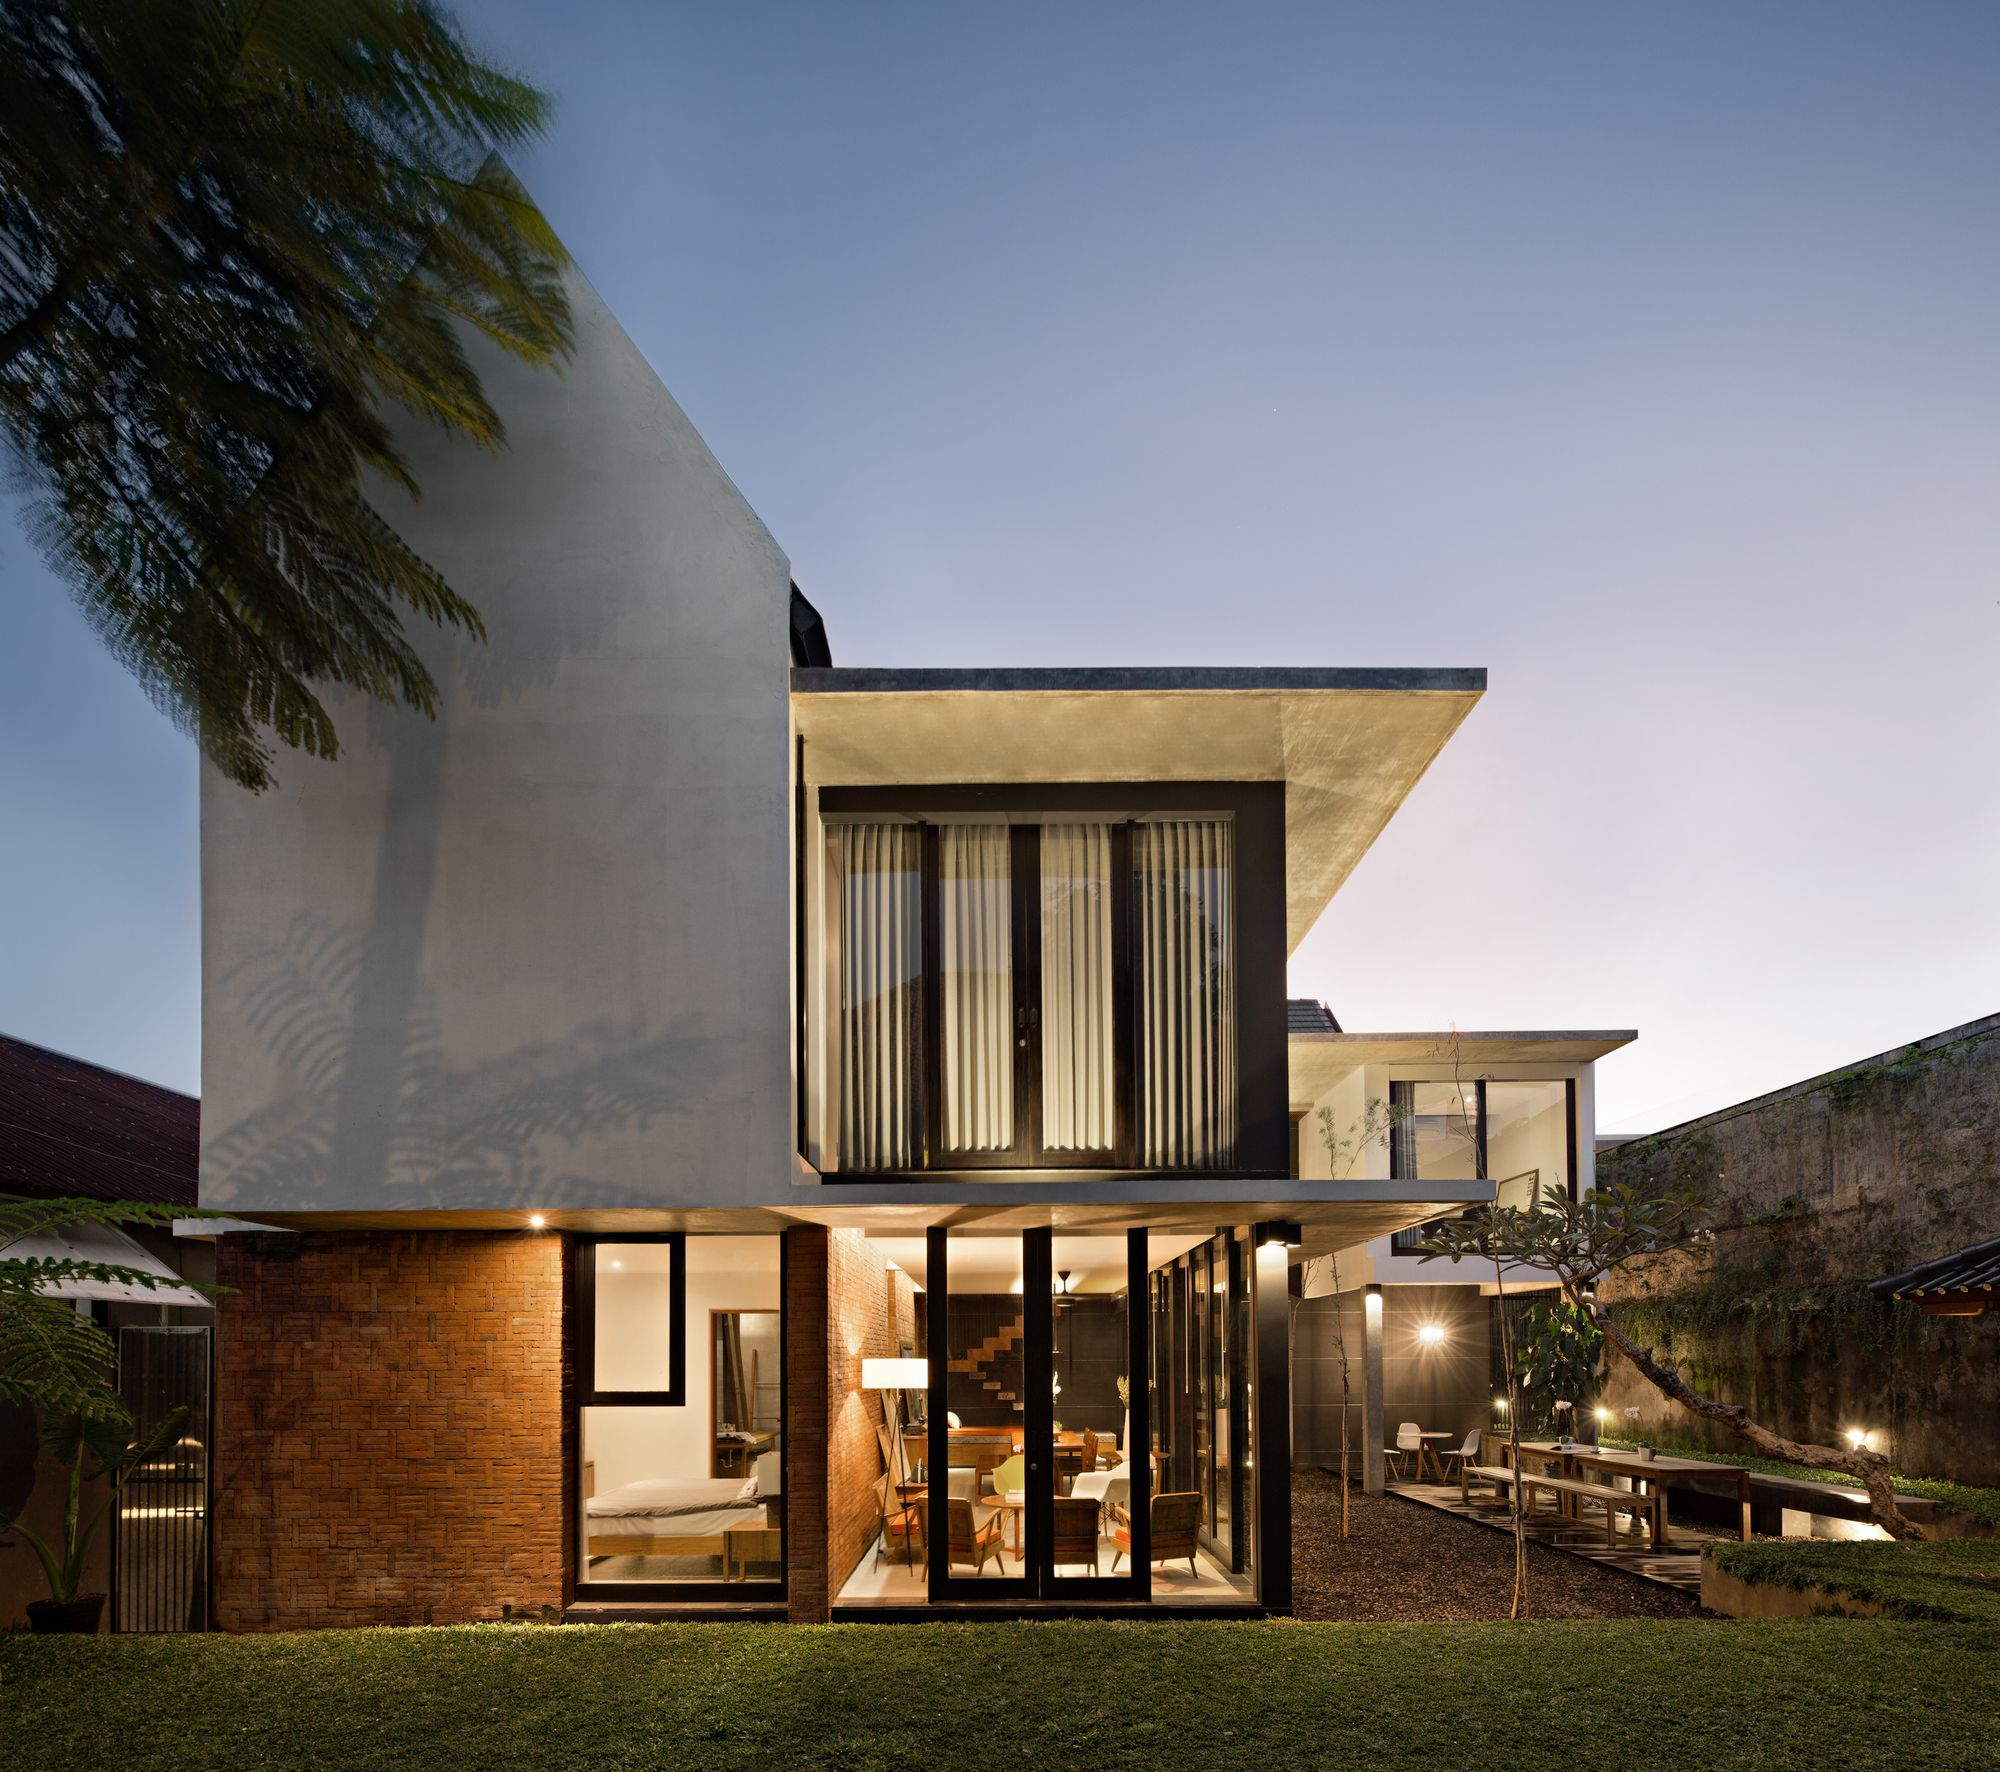 Gallery Of Sujiva Living Somia Design Studio 2 House Designs Exterior Tropical House Design Indonesian House